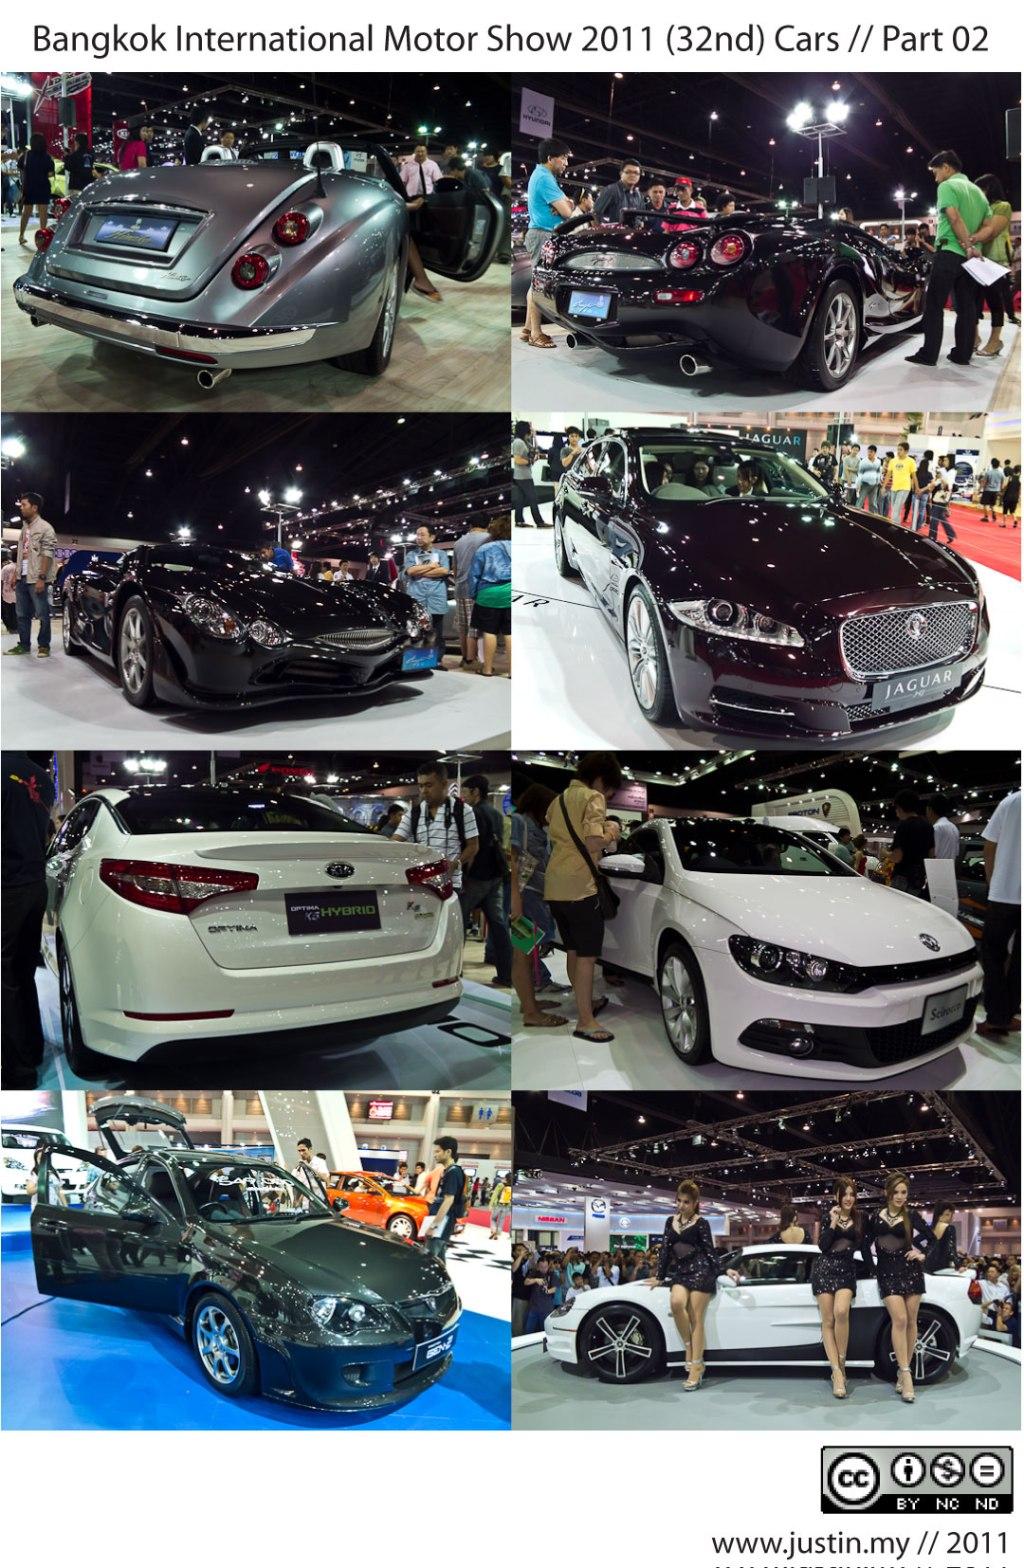 Bangkok International Motor Show 2011 Cars 02